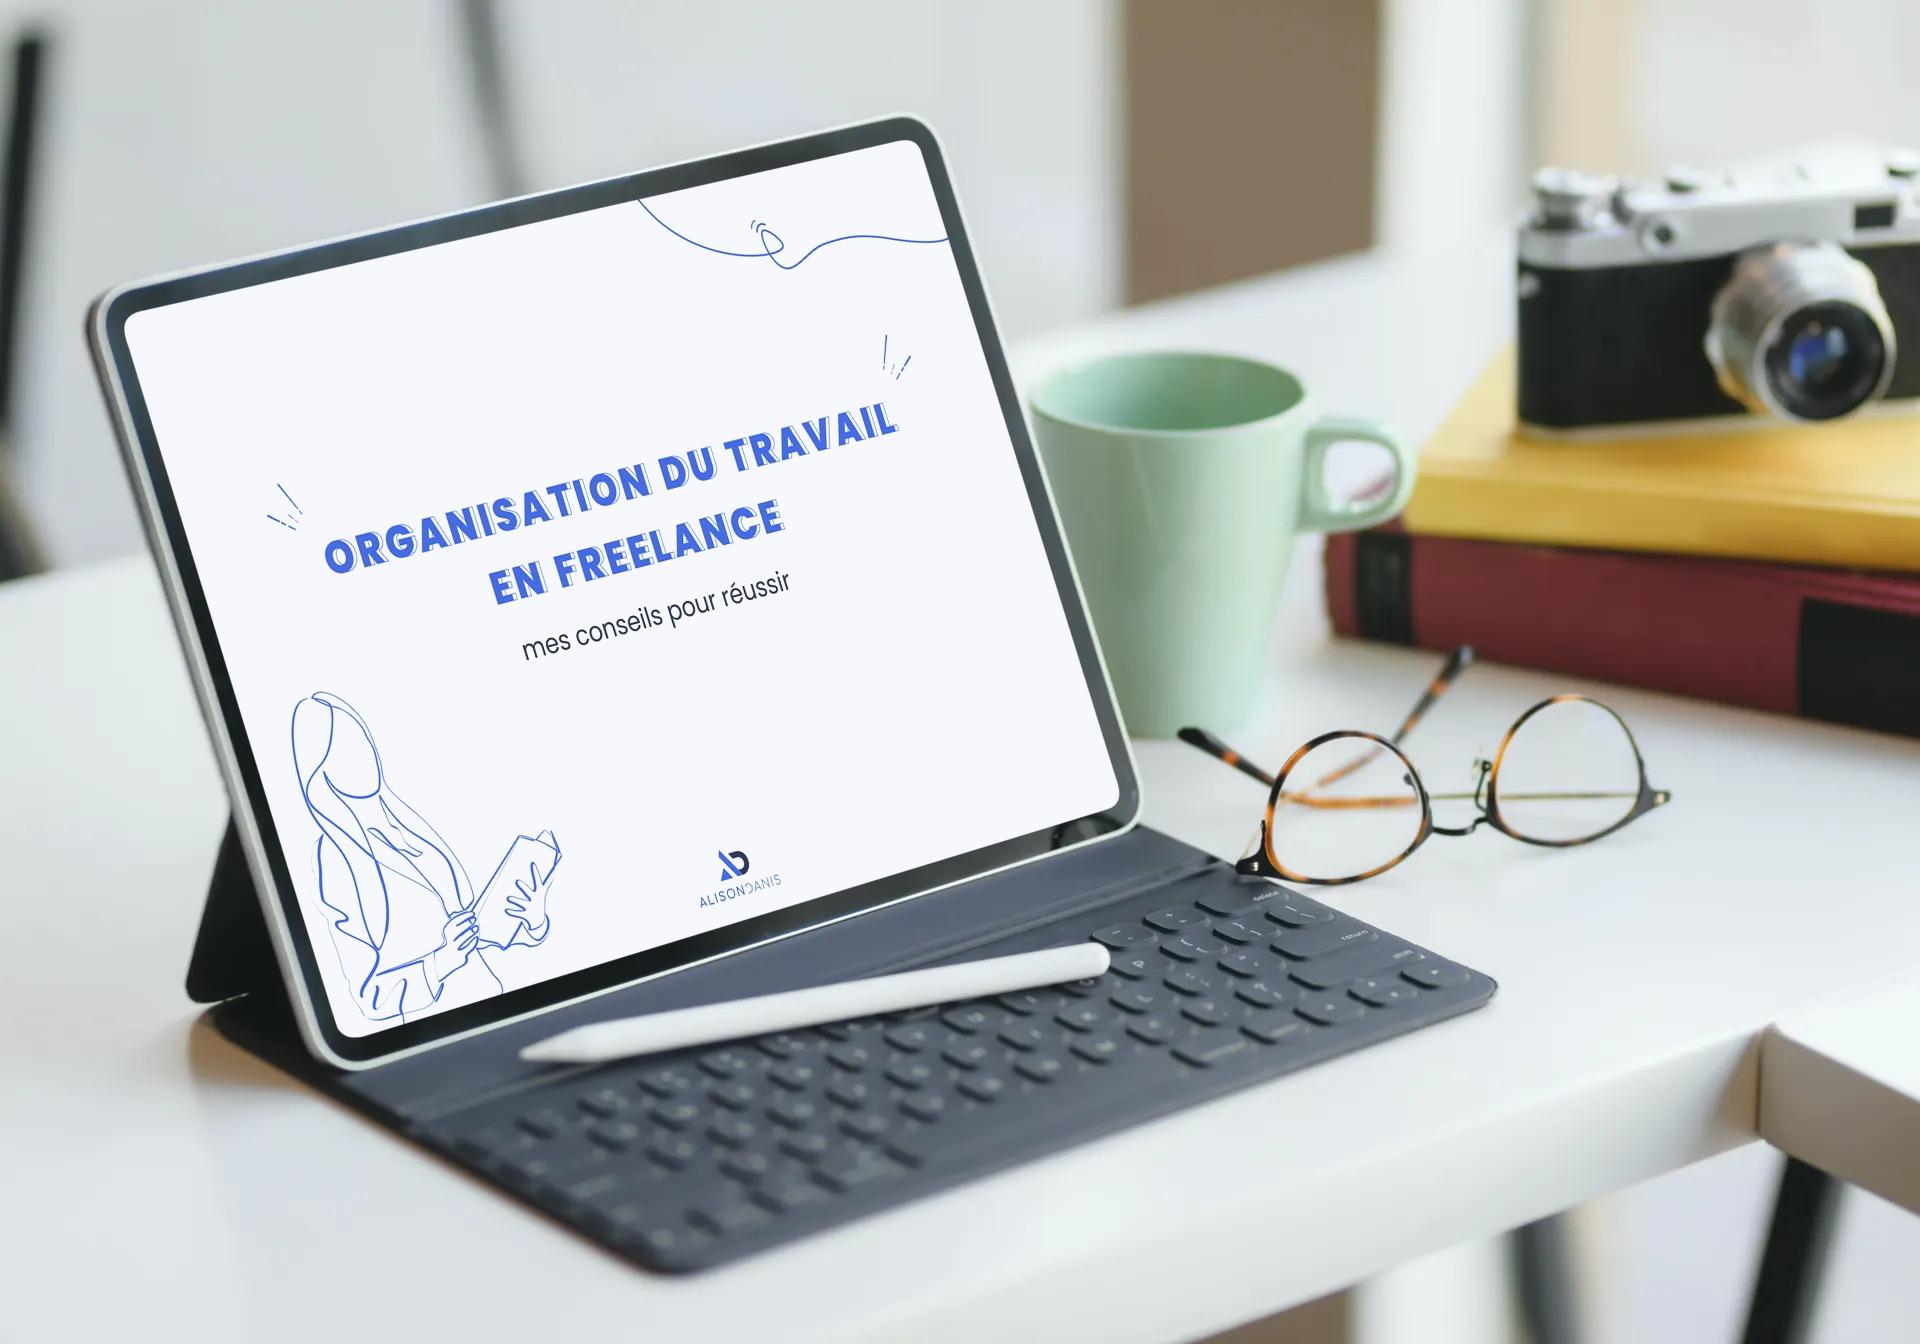 Organisation du travail en freelance